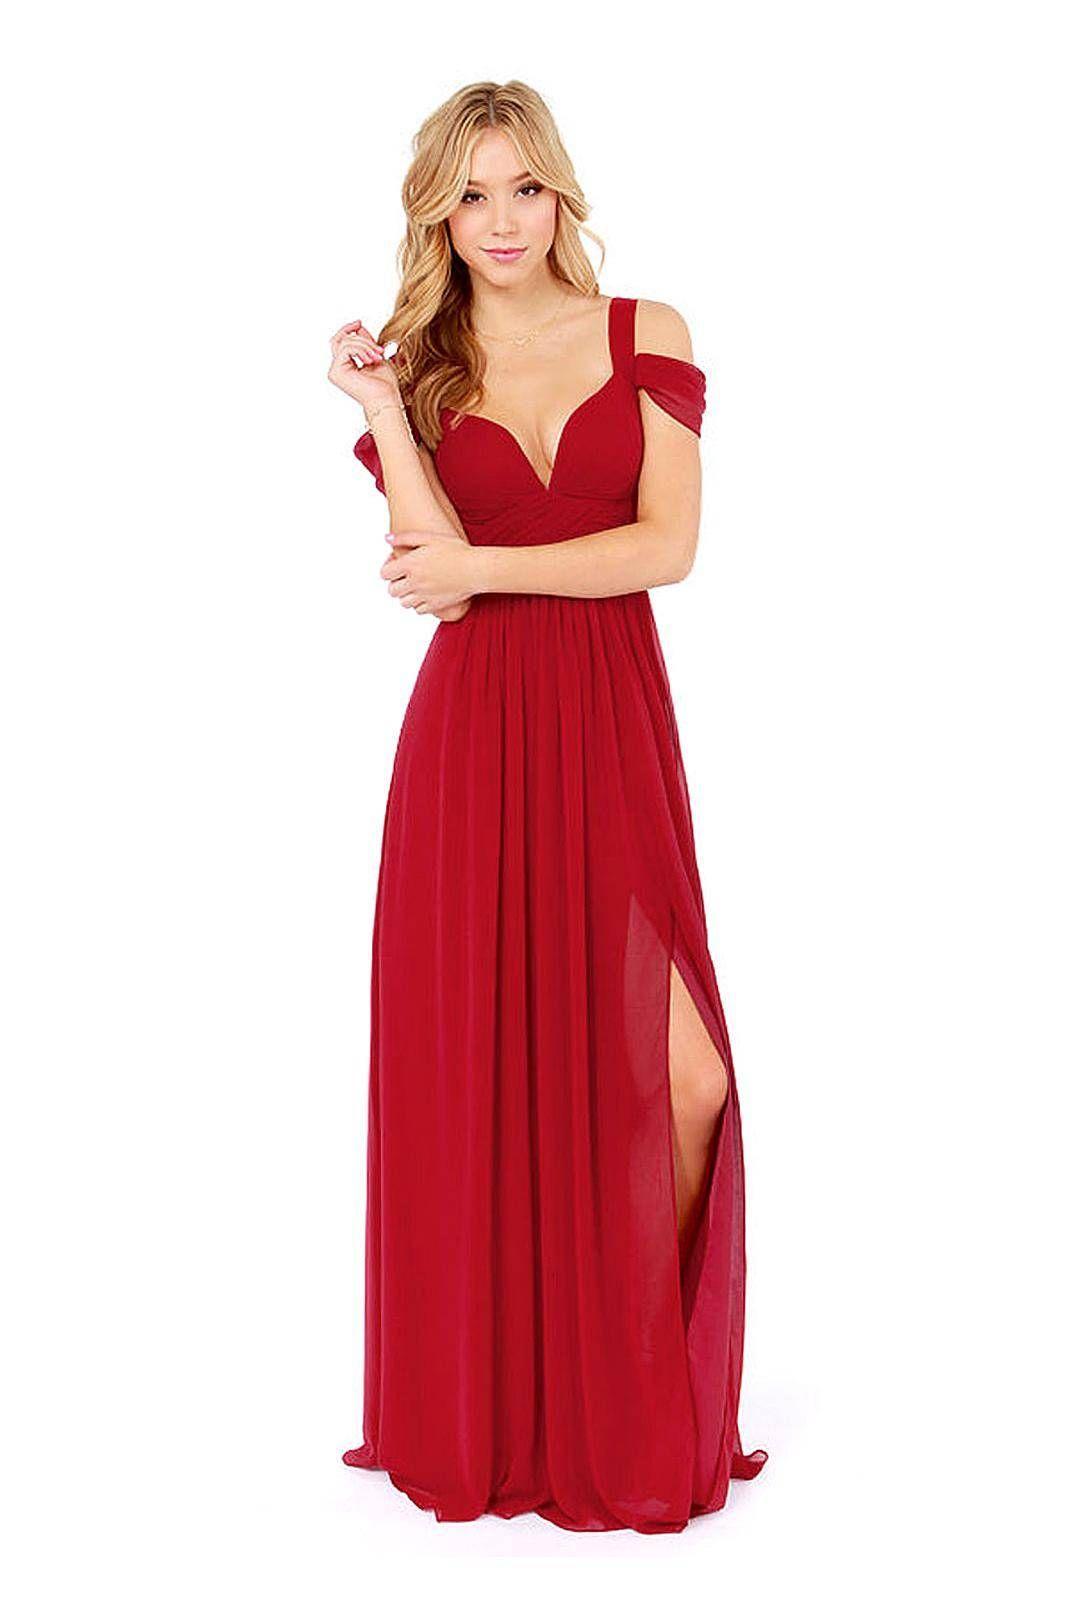 Wonderful skirts and dresses pinterest plunge dress maxi